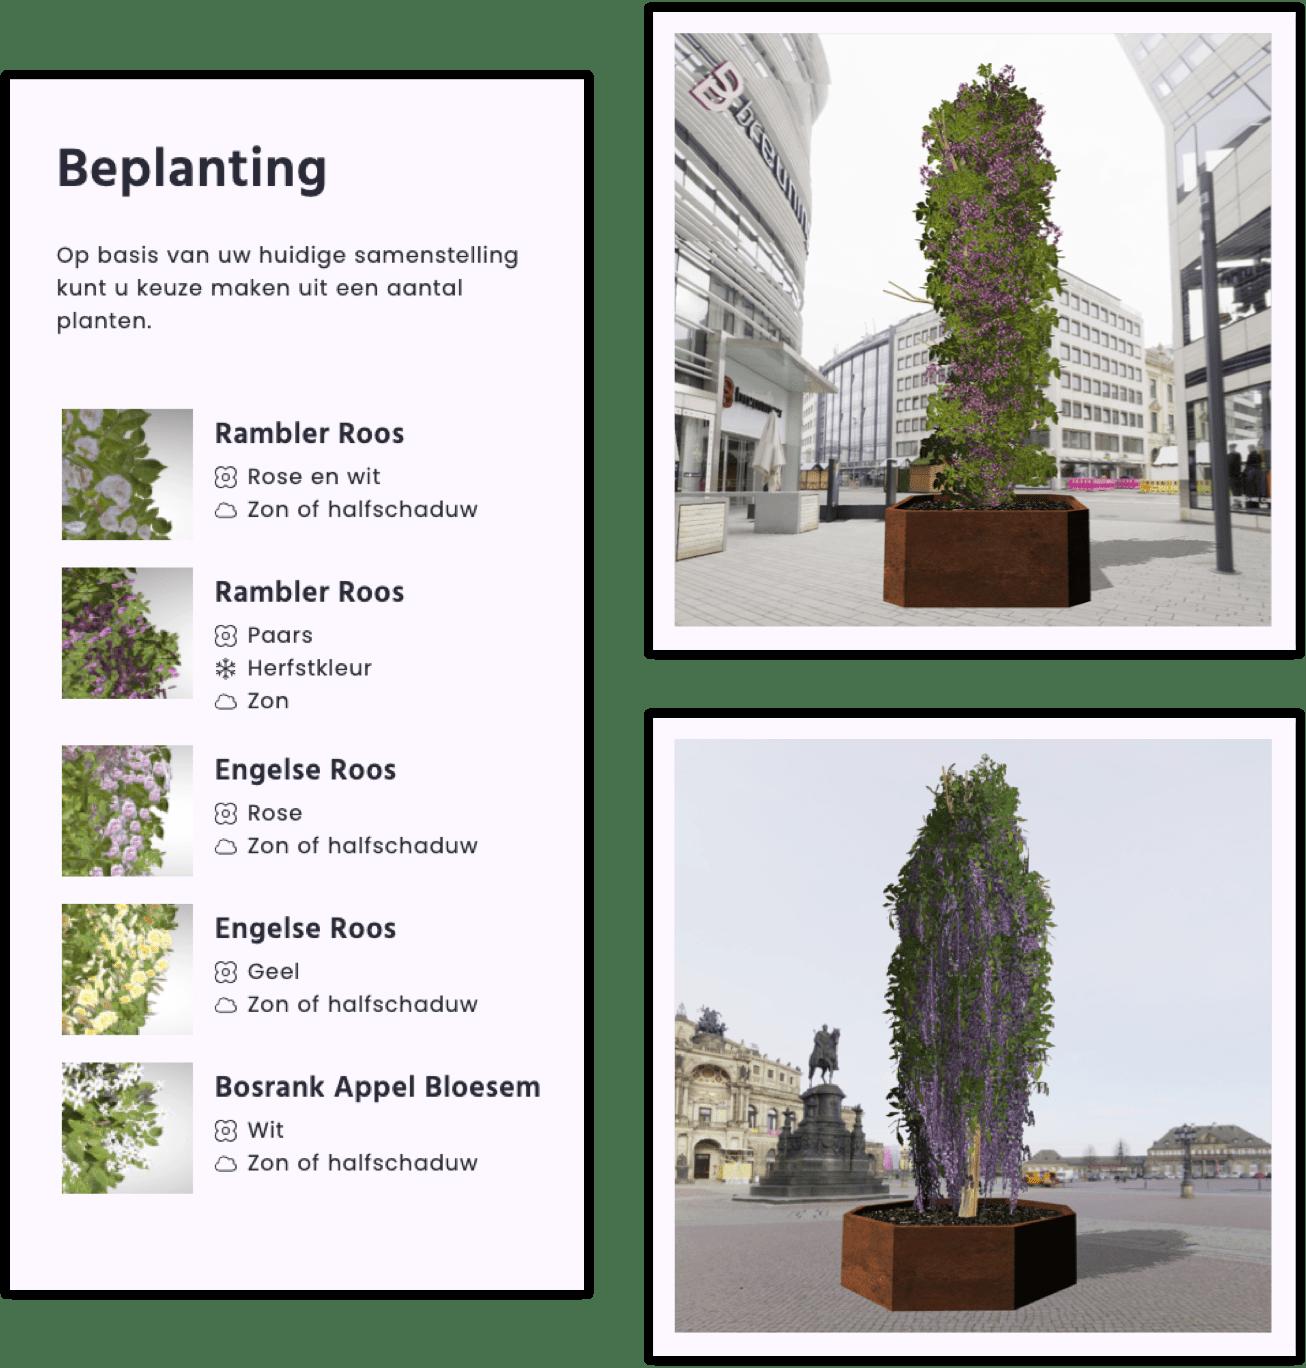 De unieke Urban Tree configurator tool